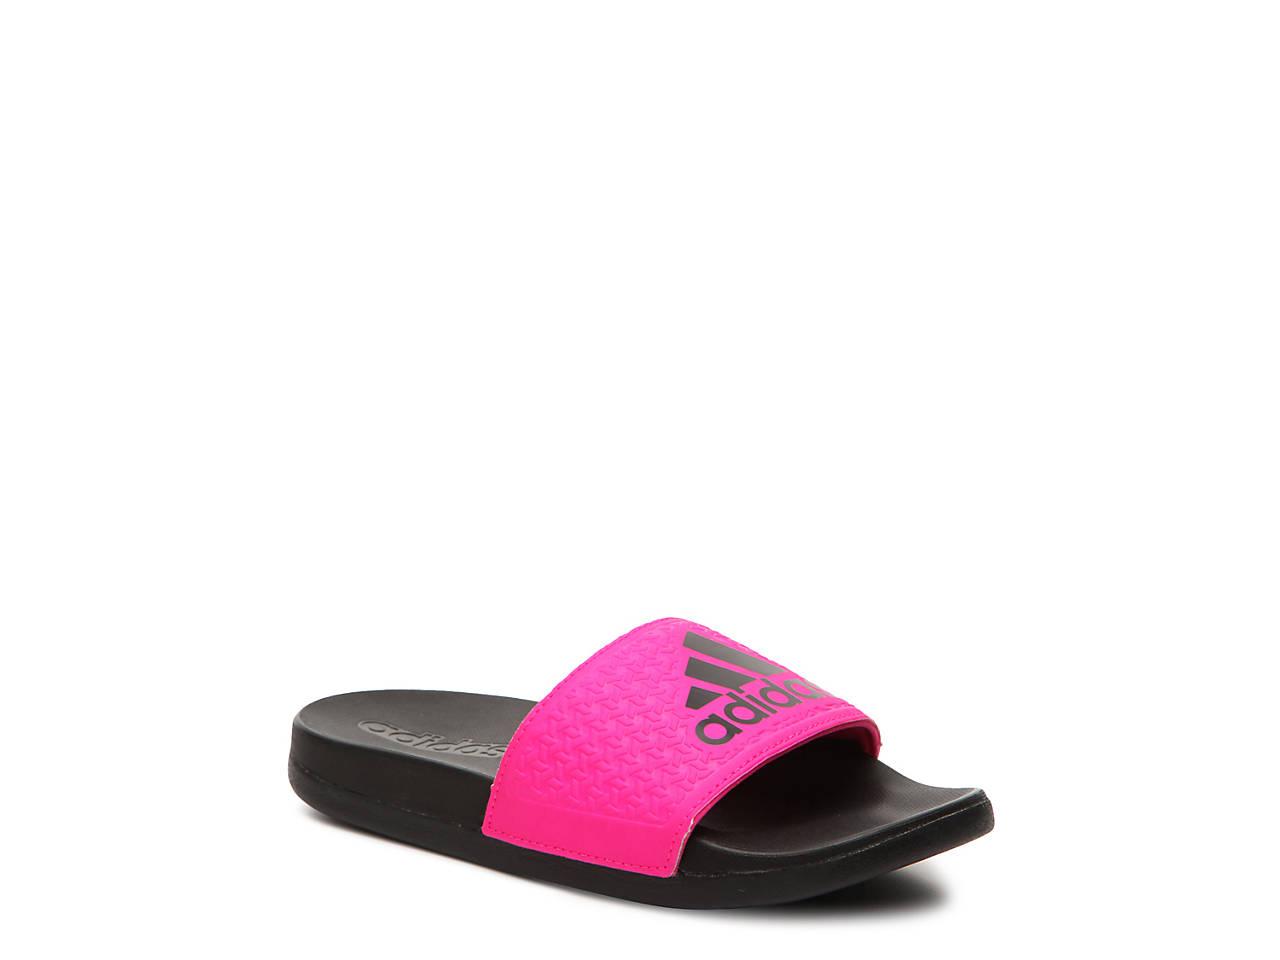 f741ac071 adidas Adilette Ultra Toddler   Youth Slide Sandal Kids Shoes